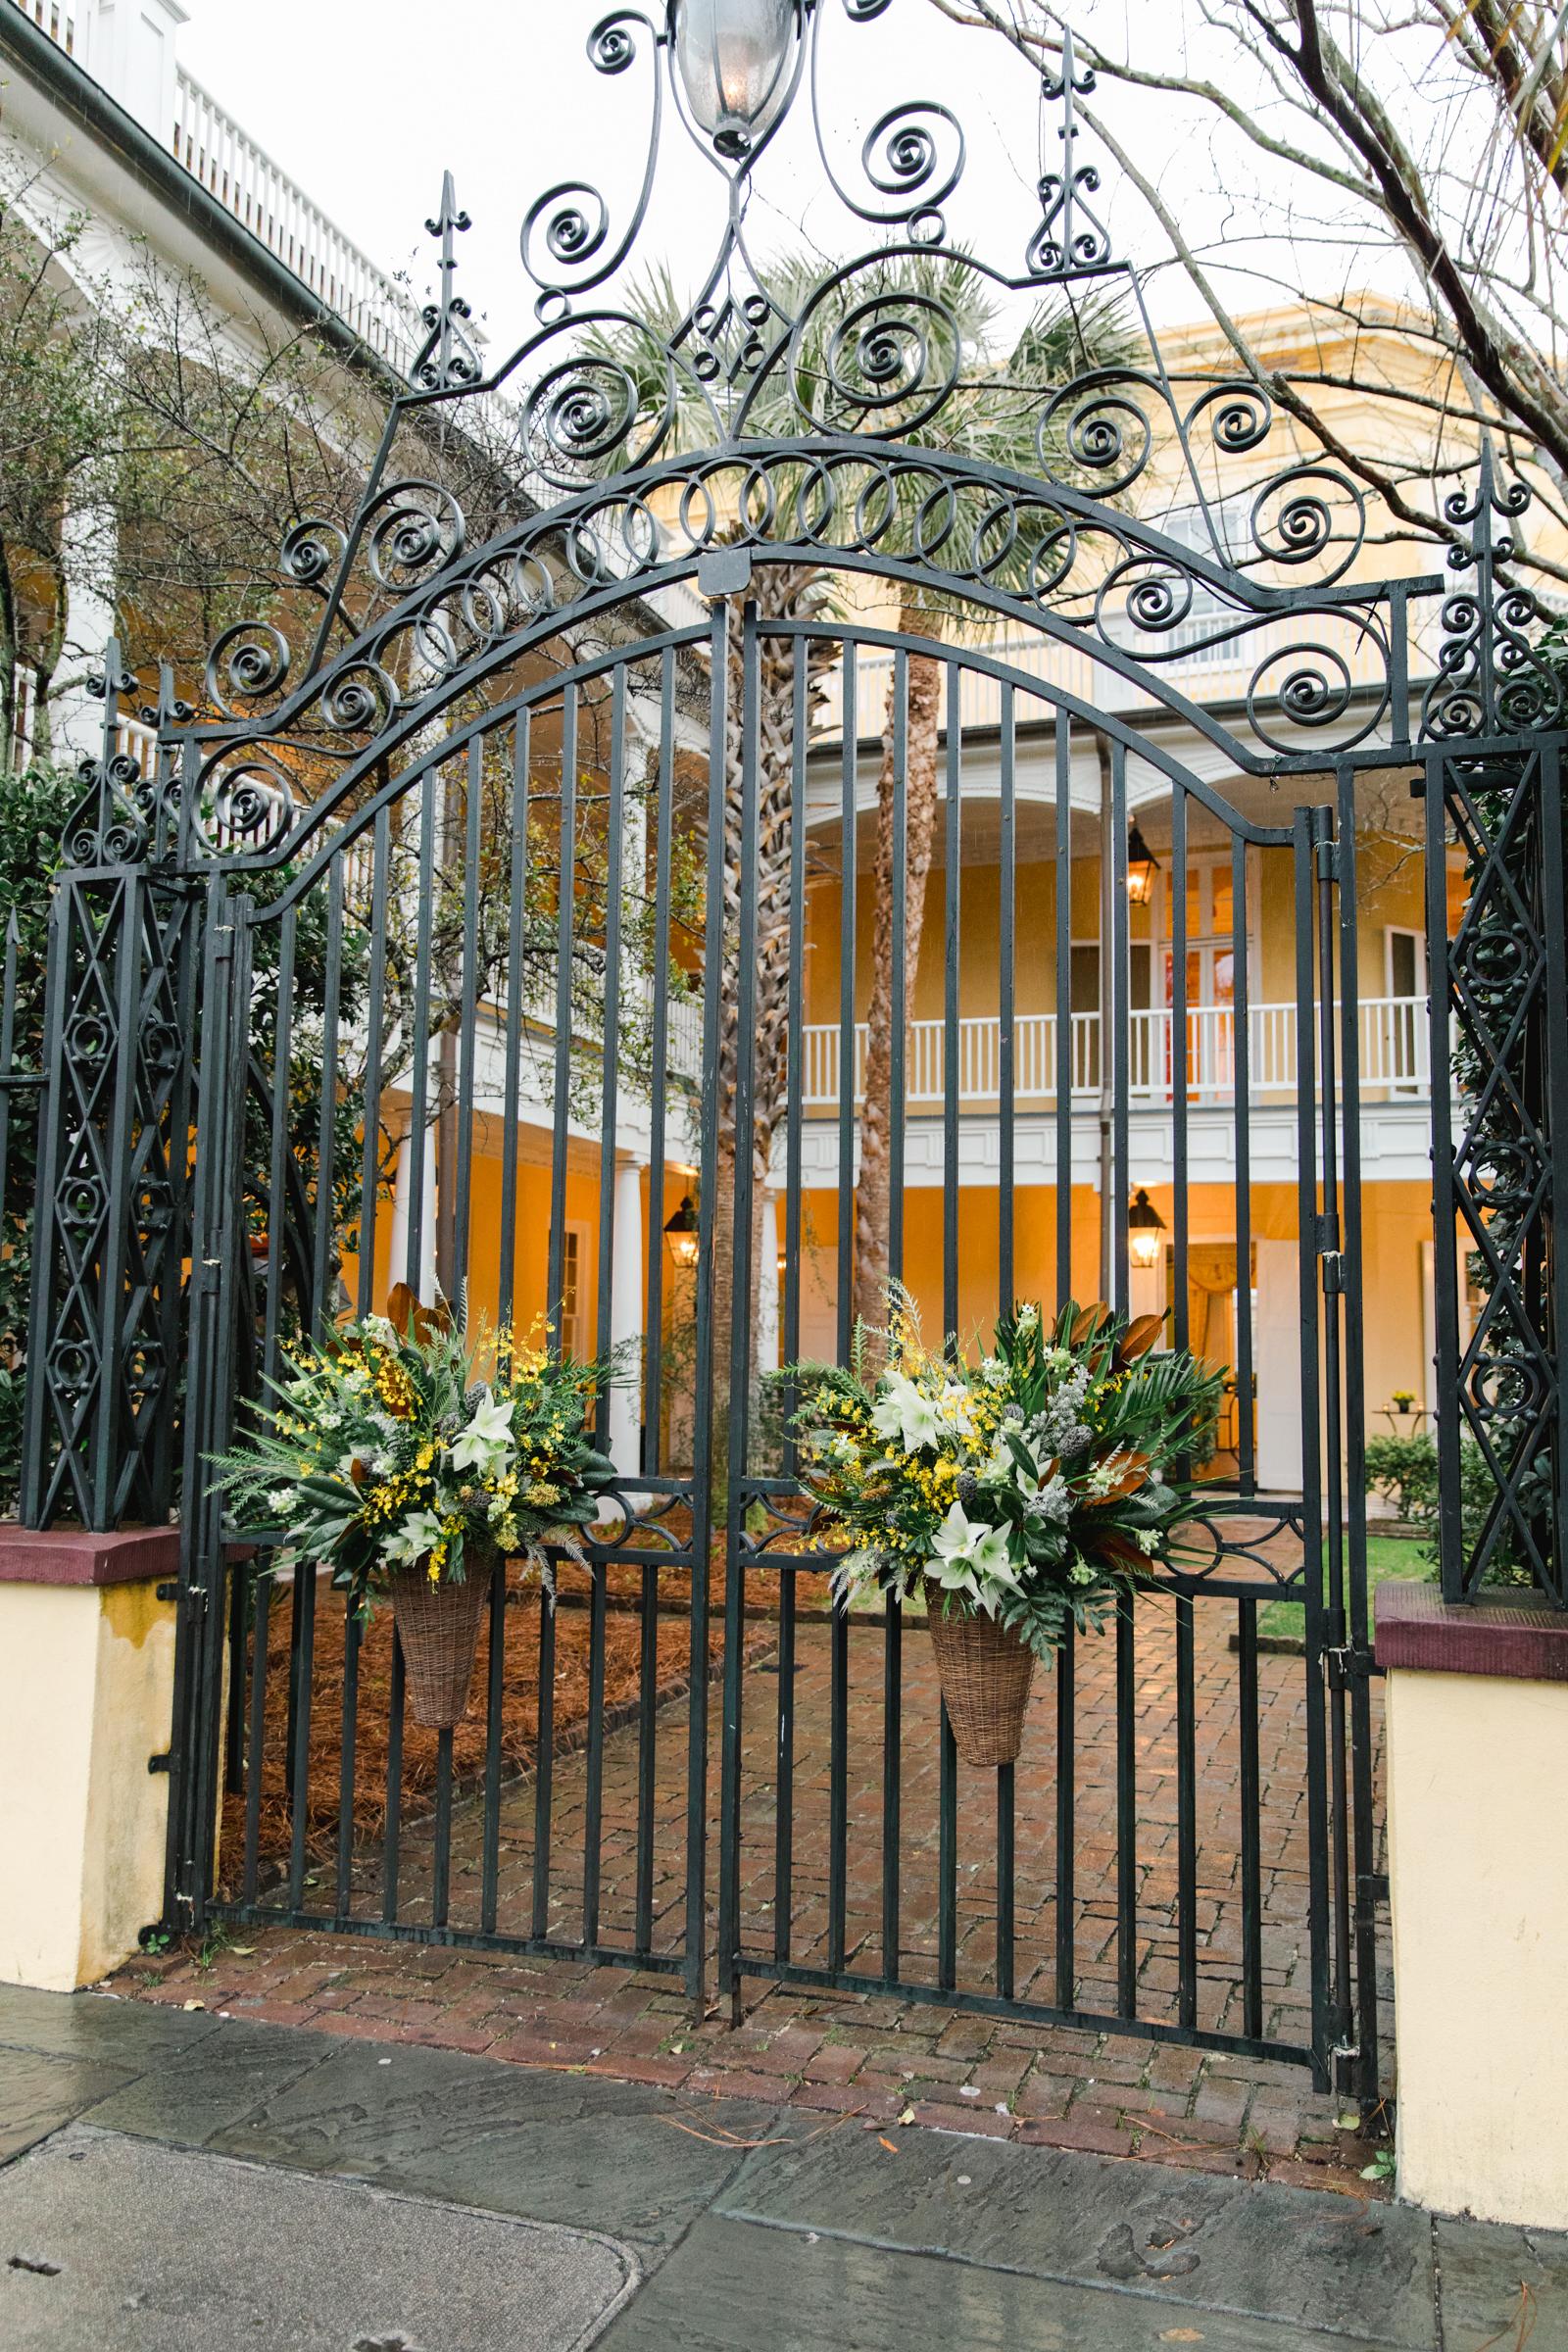 hamida charlie charleson wedding welcome party gate flowers